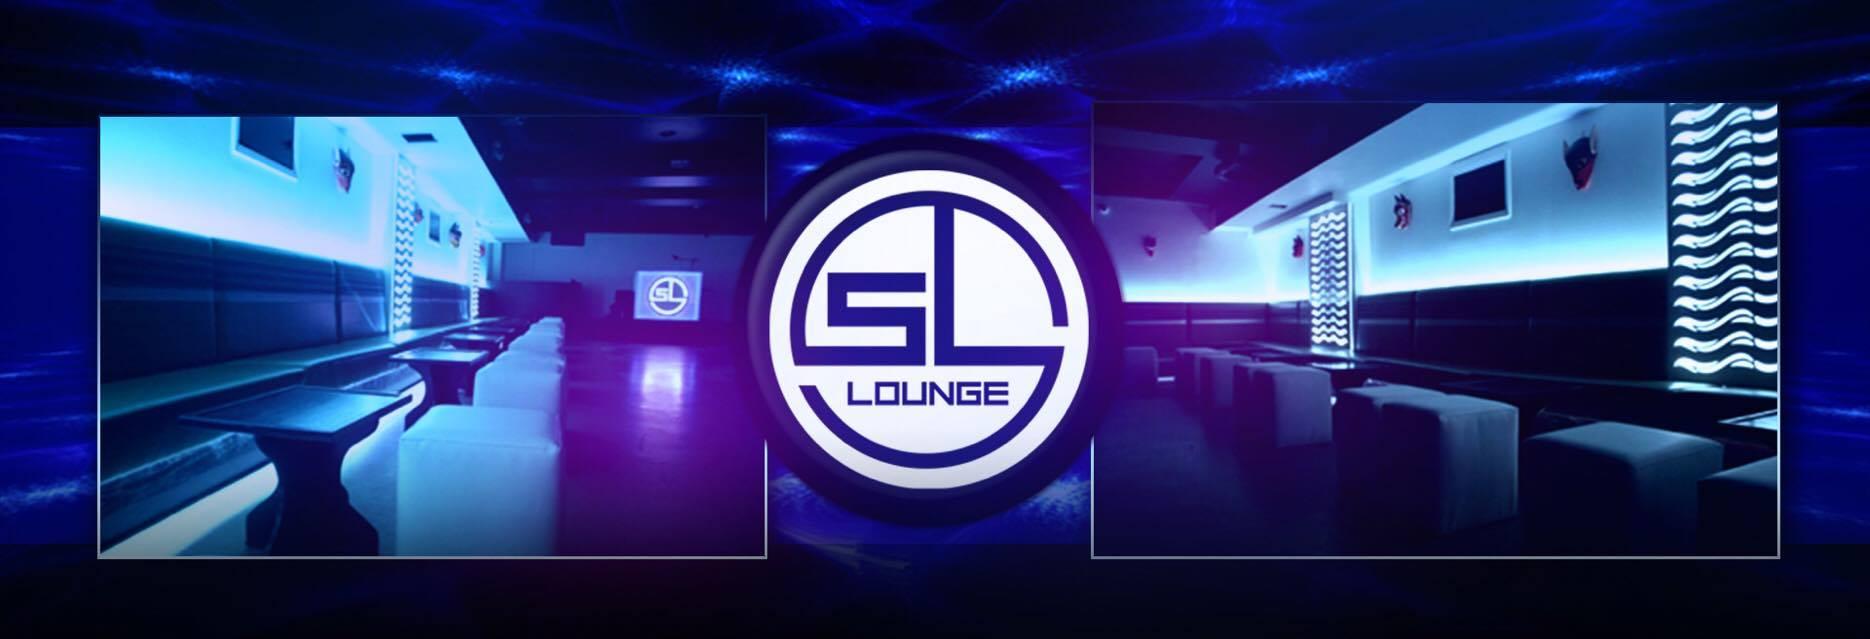 SL LOUNGE